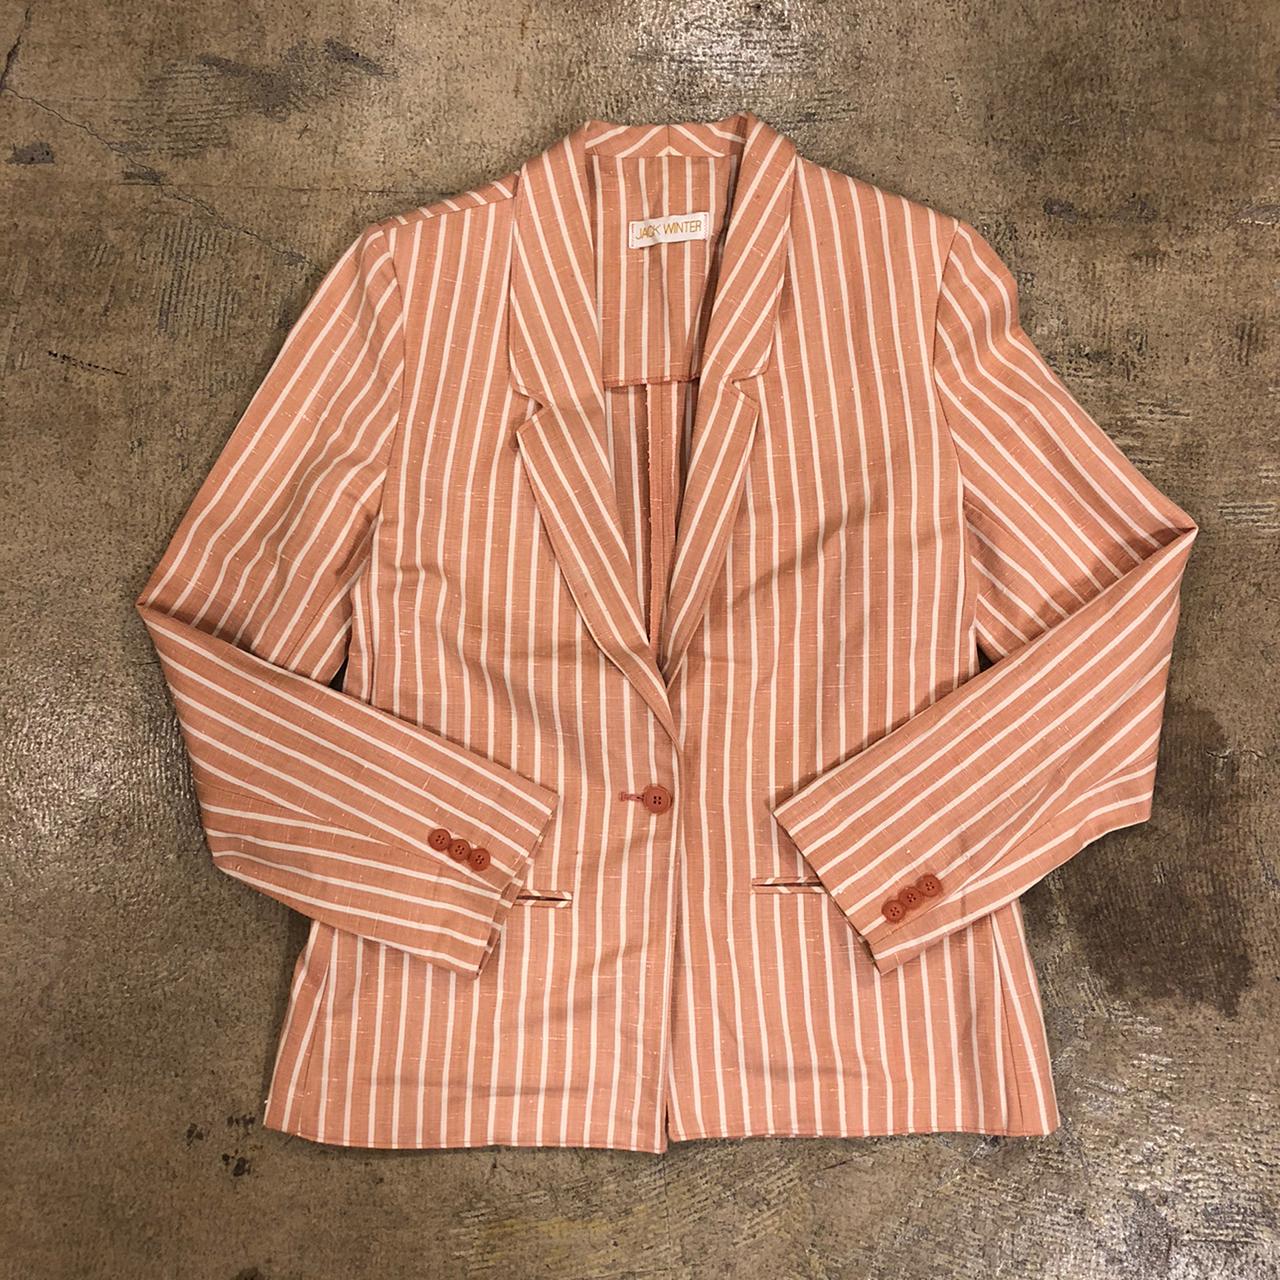 Jack Winter Stripe Jacket ¥8,200+tax